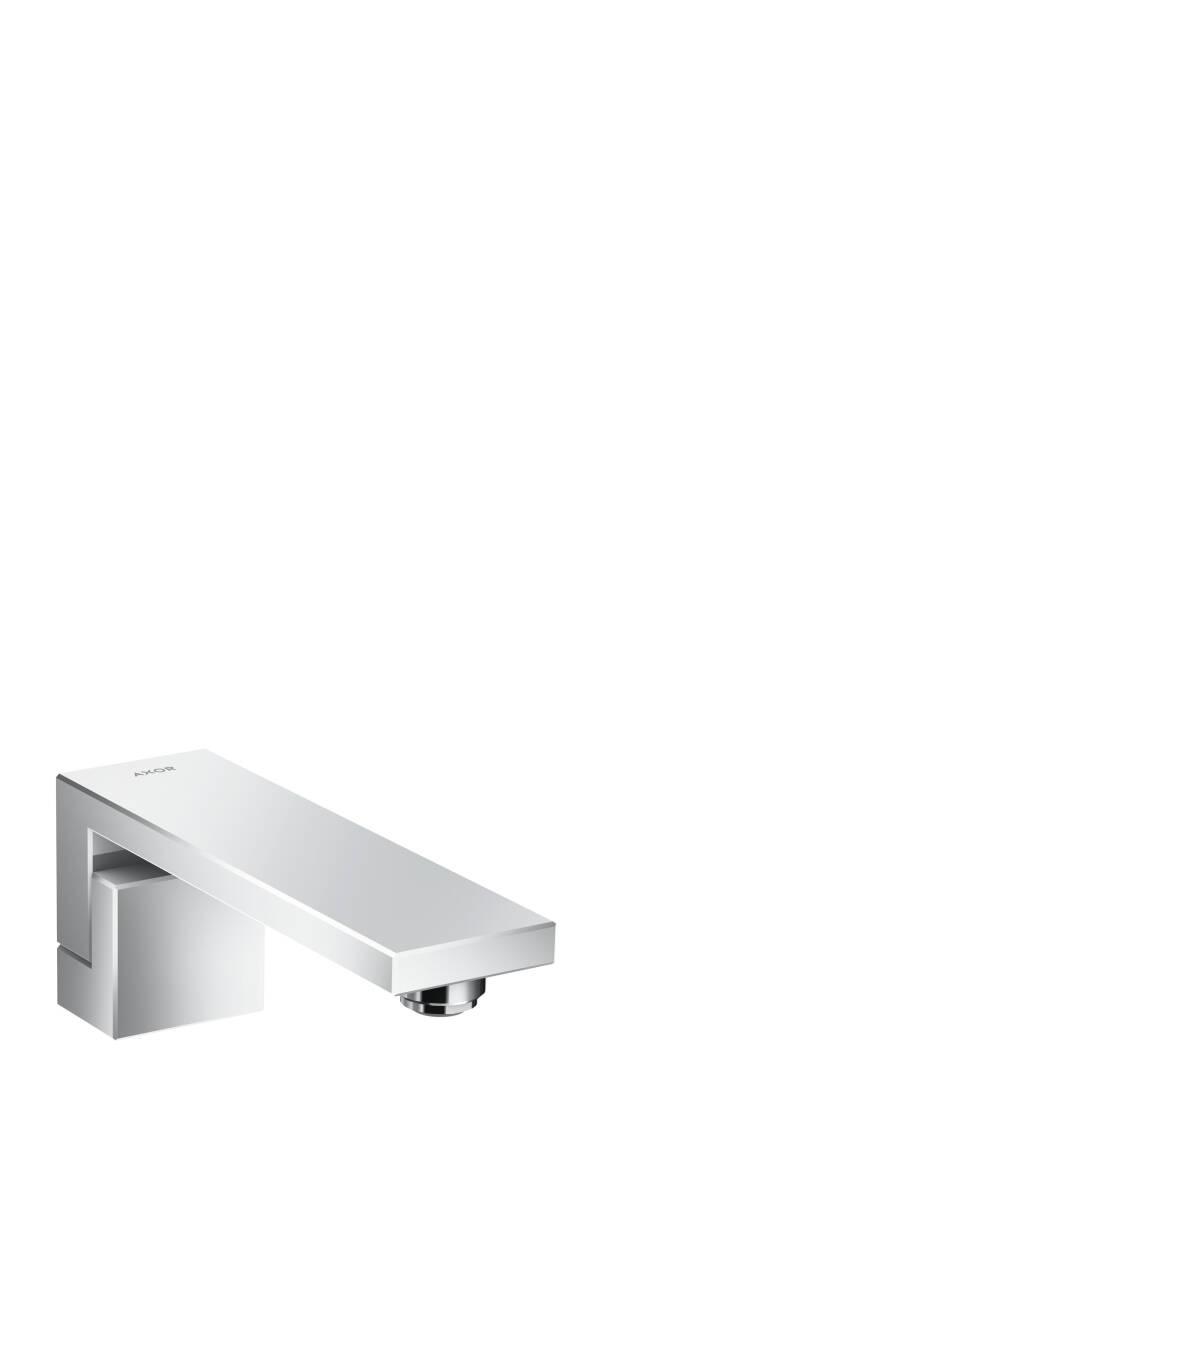 Bath spout, Chrome, 46410000